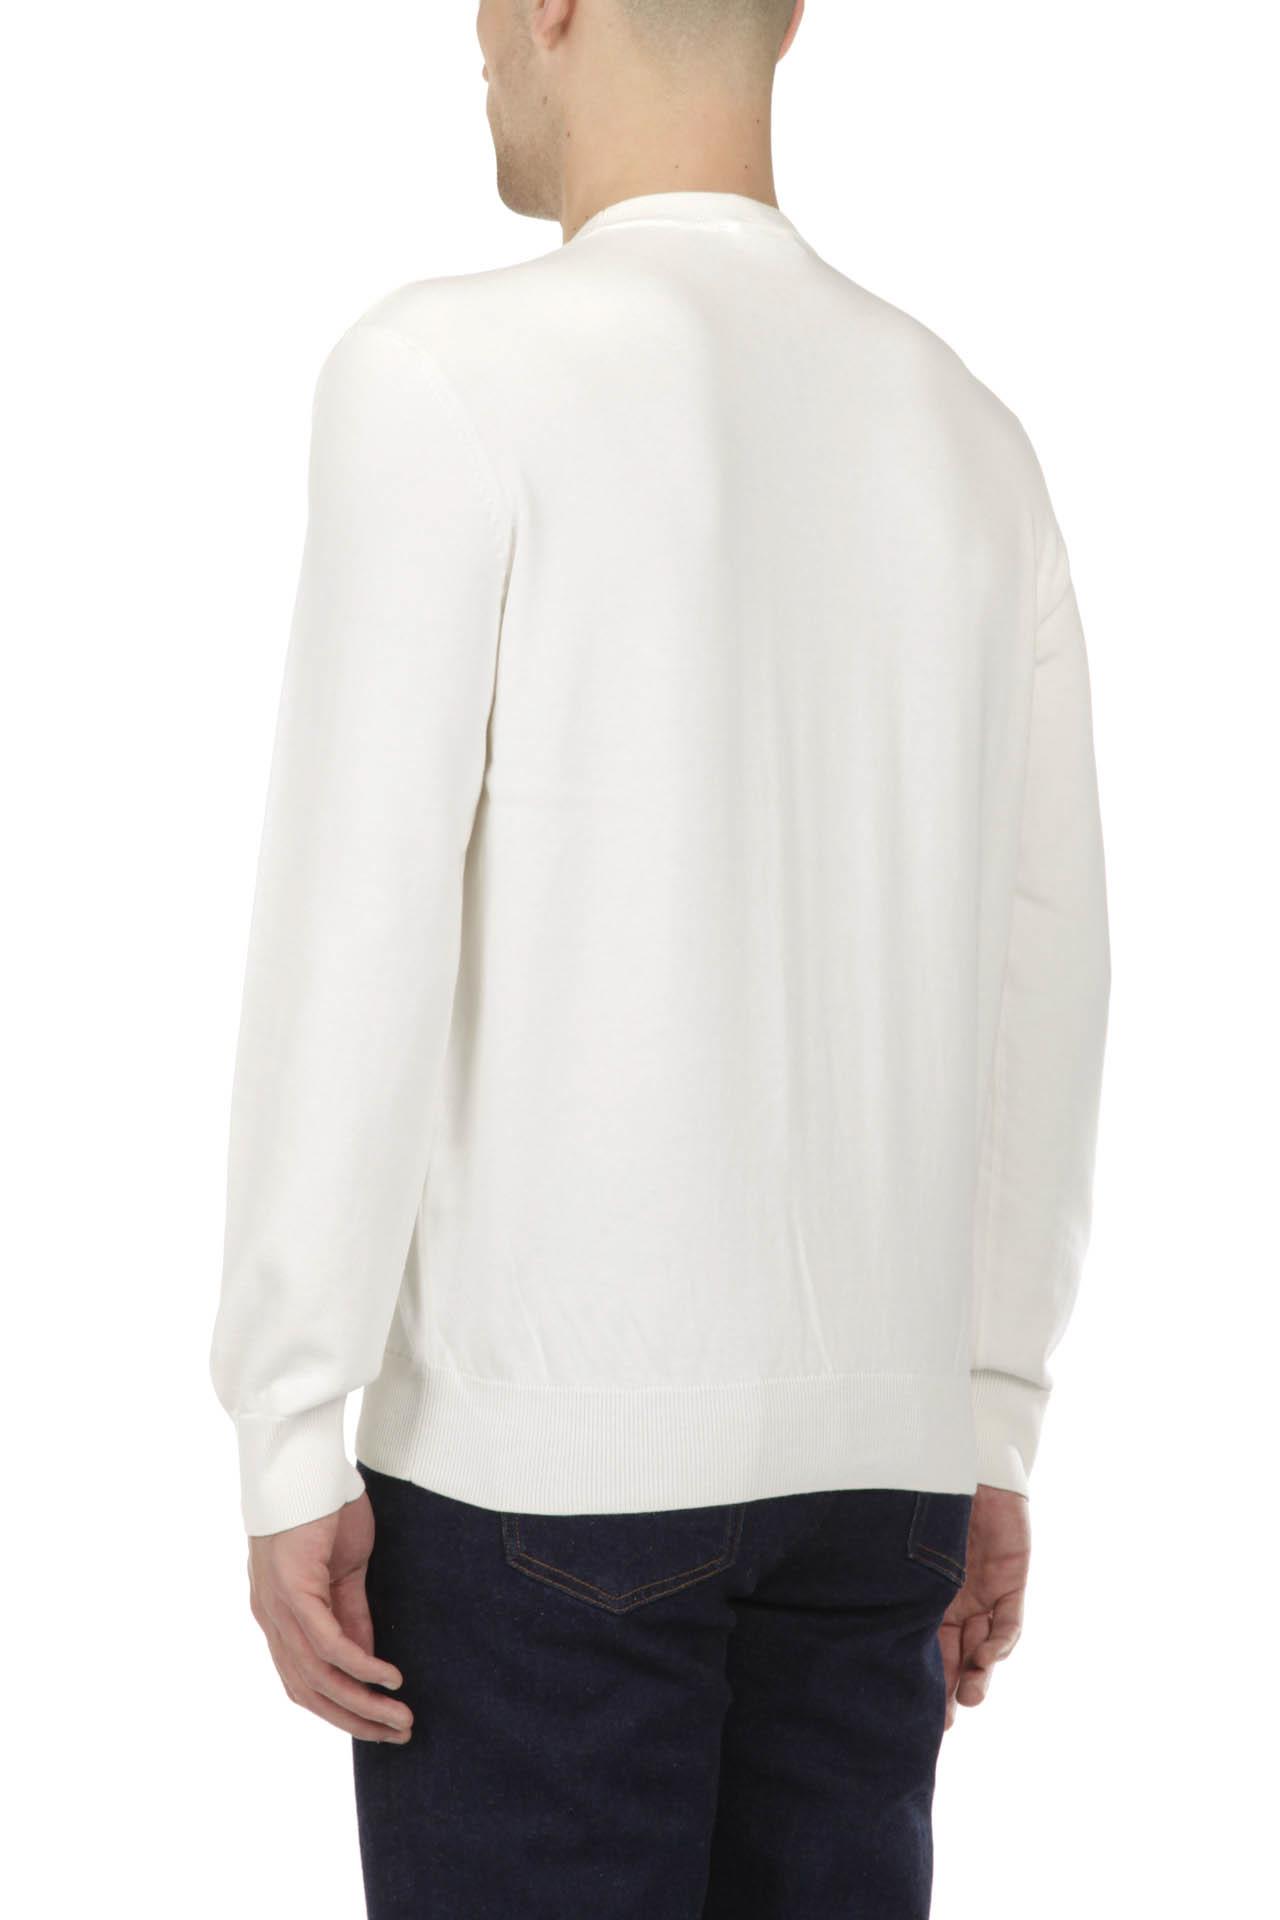 APC | Knitwear | CODDAH23866